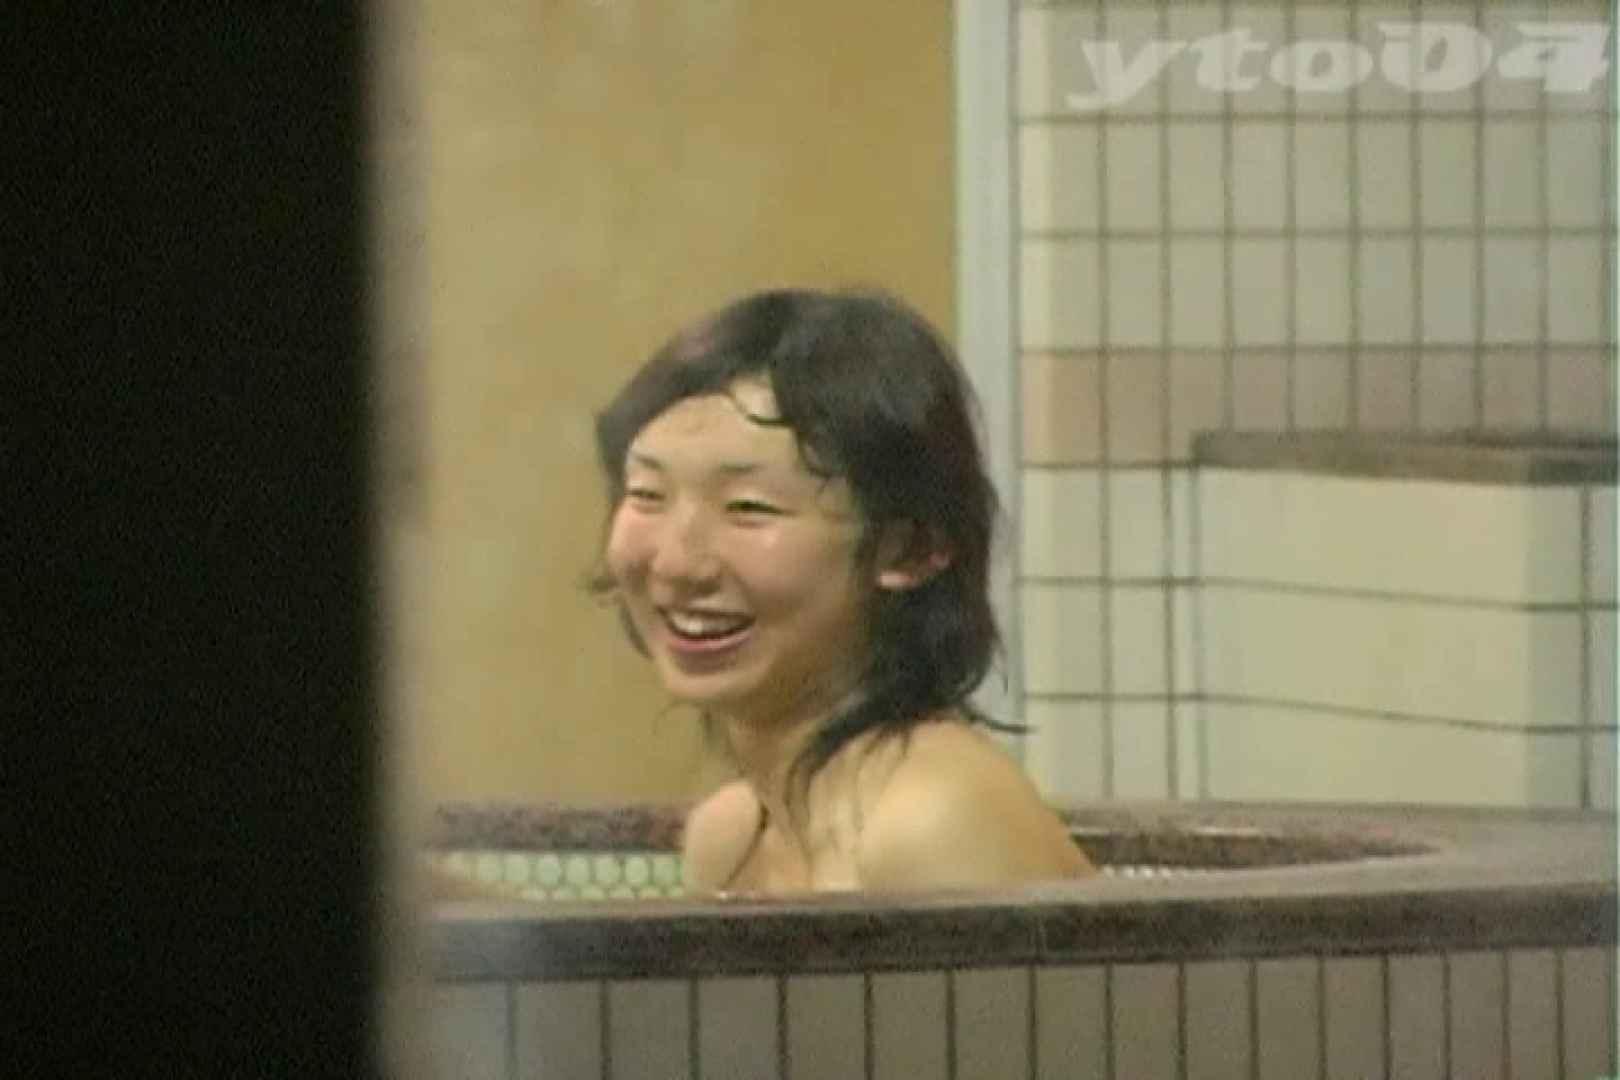 ▲復活限定▲合宿ホテル女風呂盗撮 Vol.24 名作  55pic 20